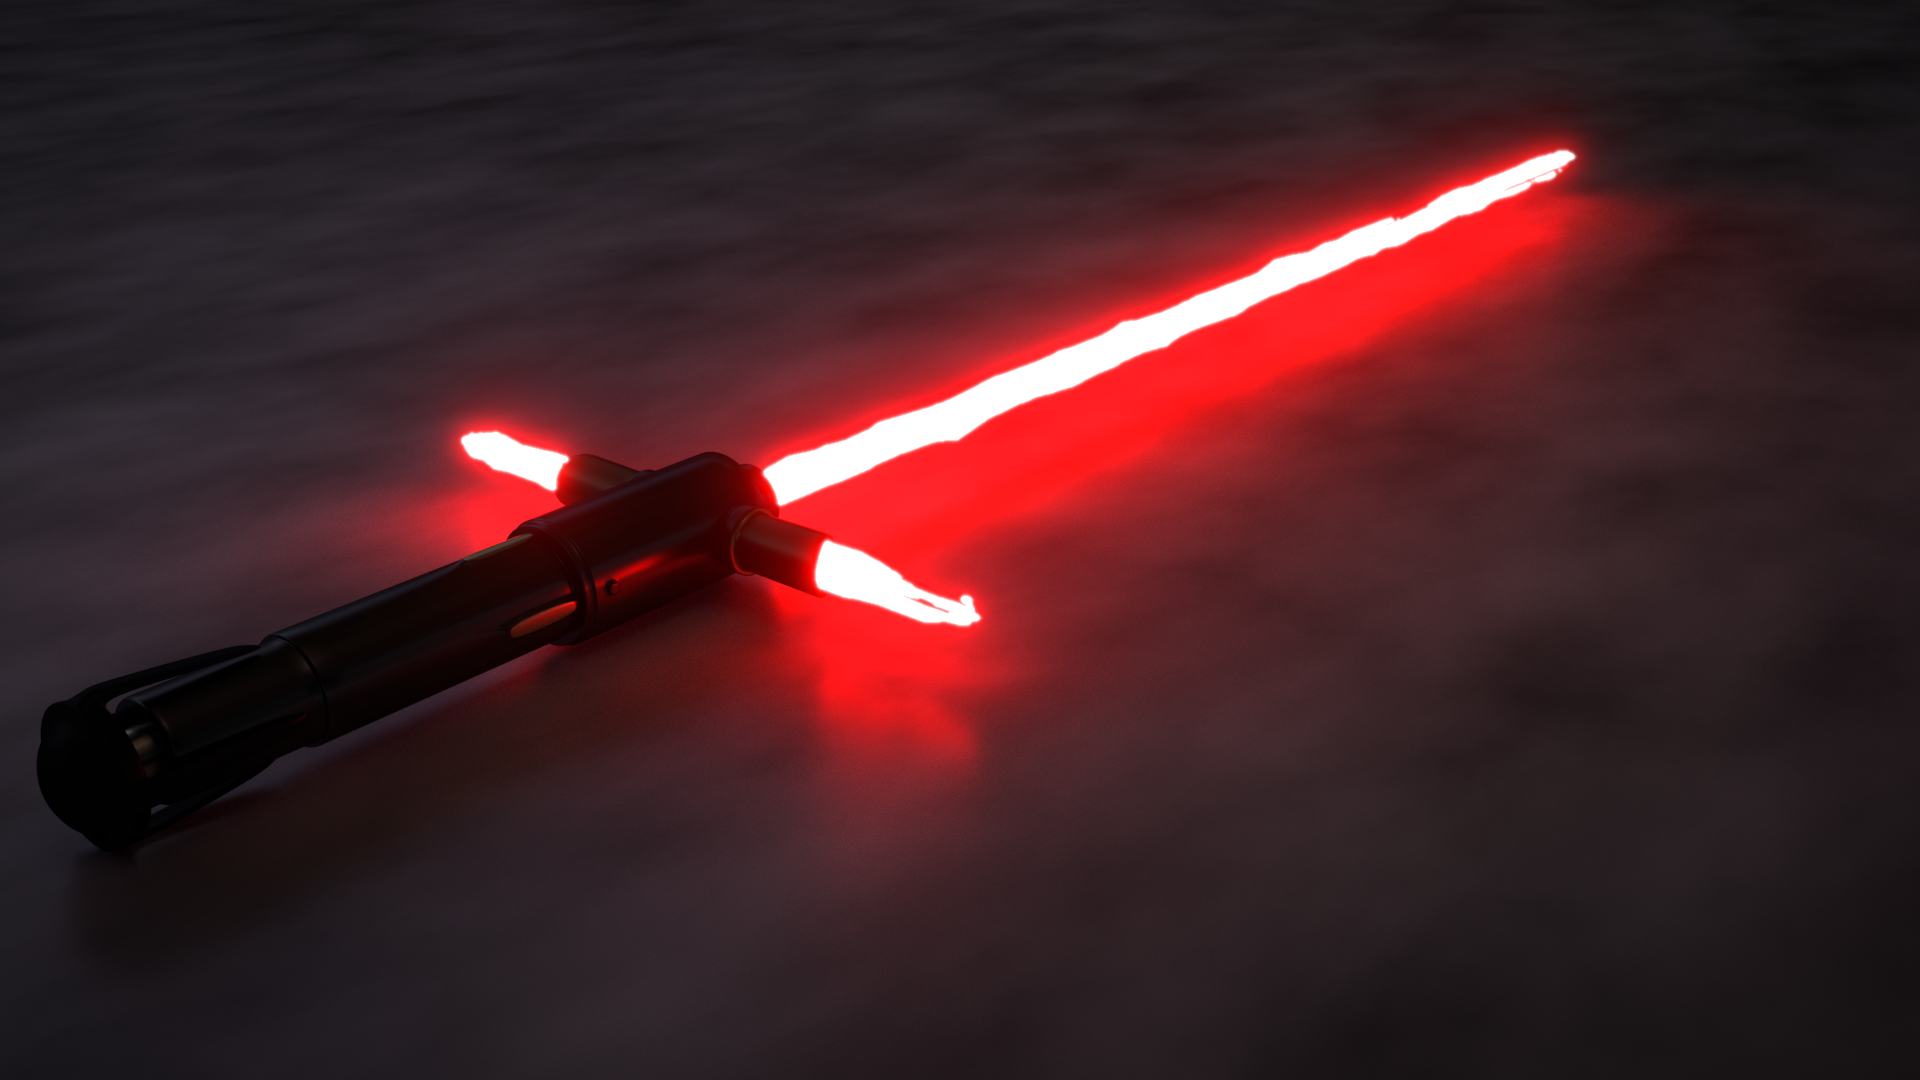 Kylo Ren's Lightsaber by Dulana57